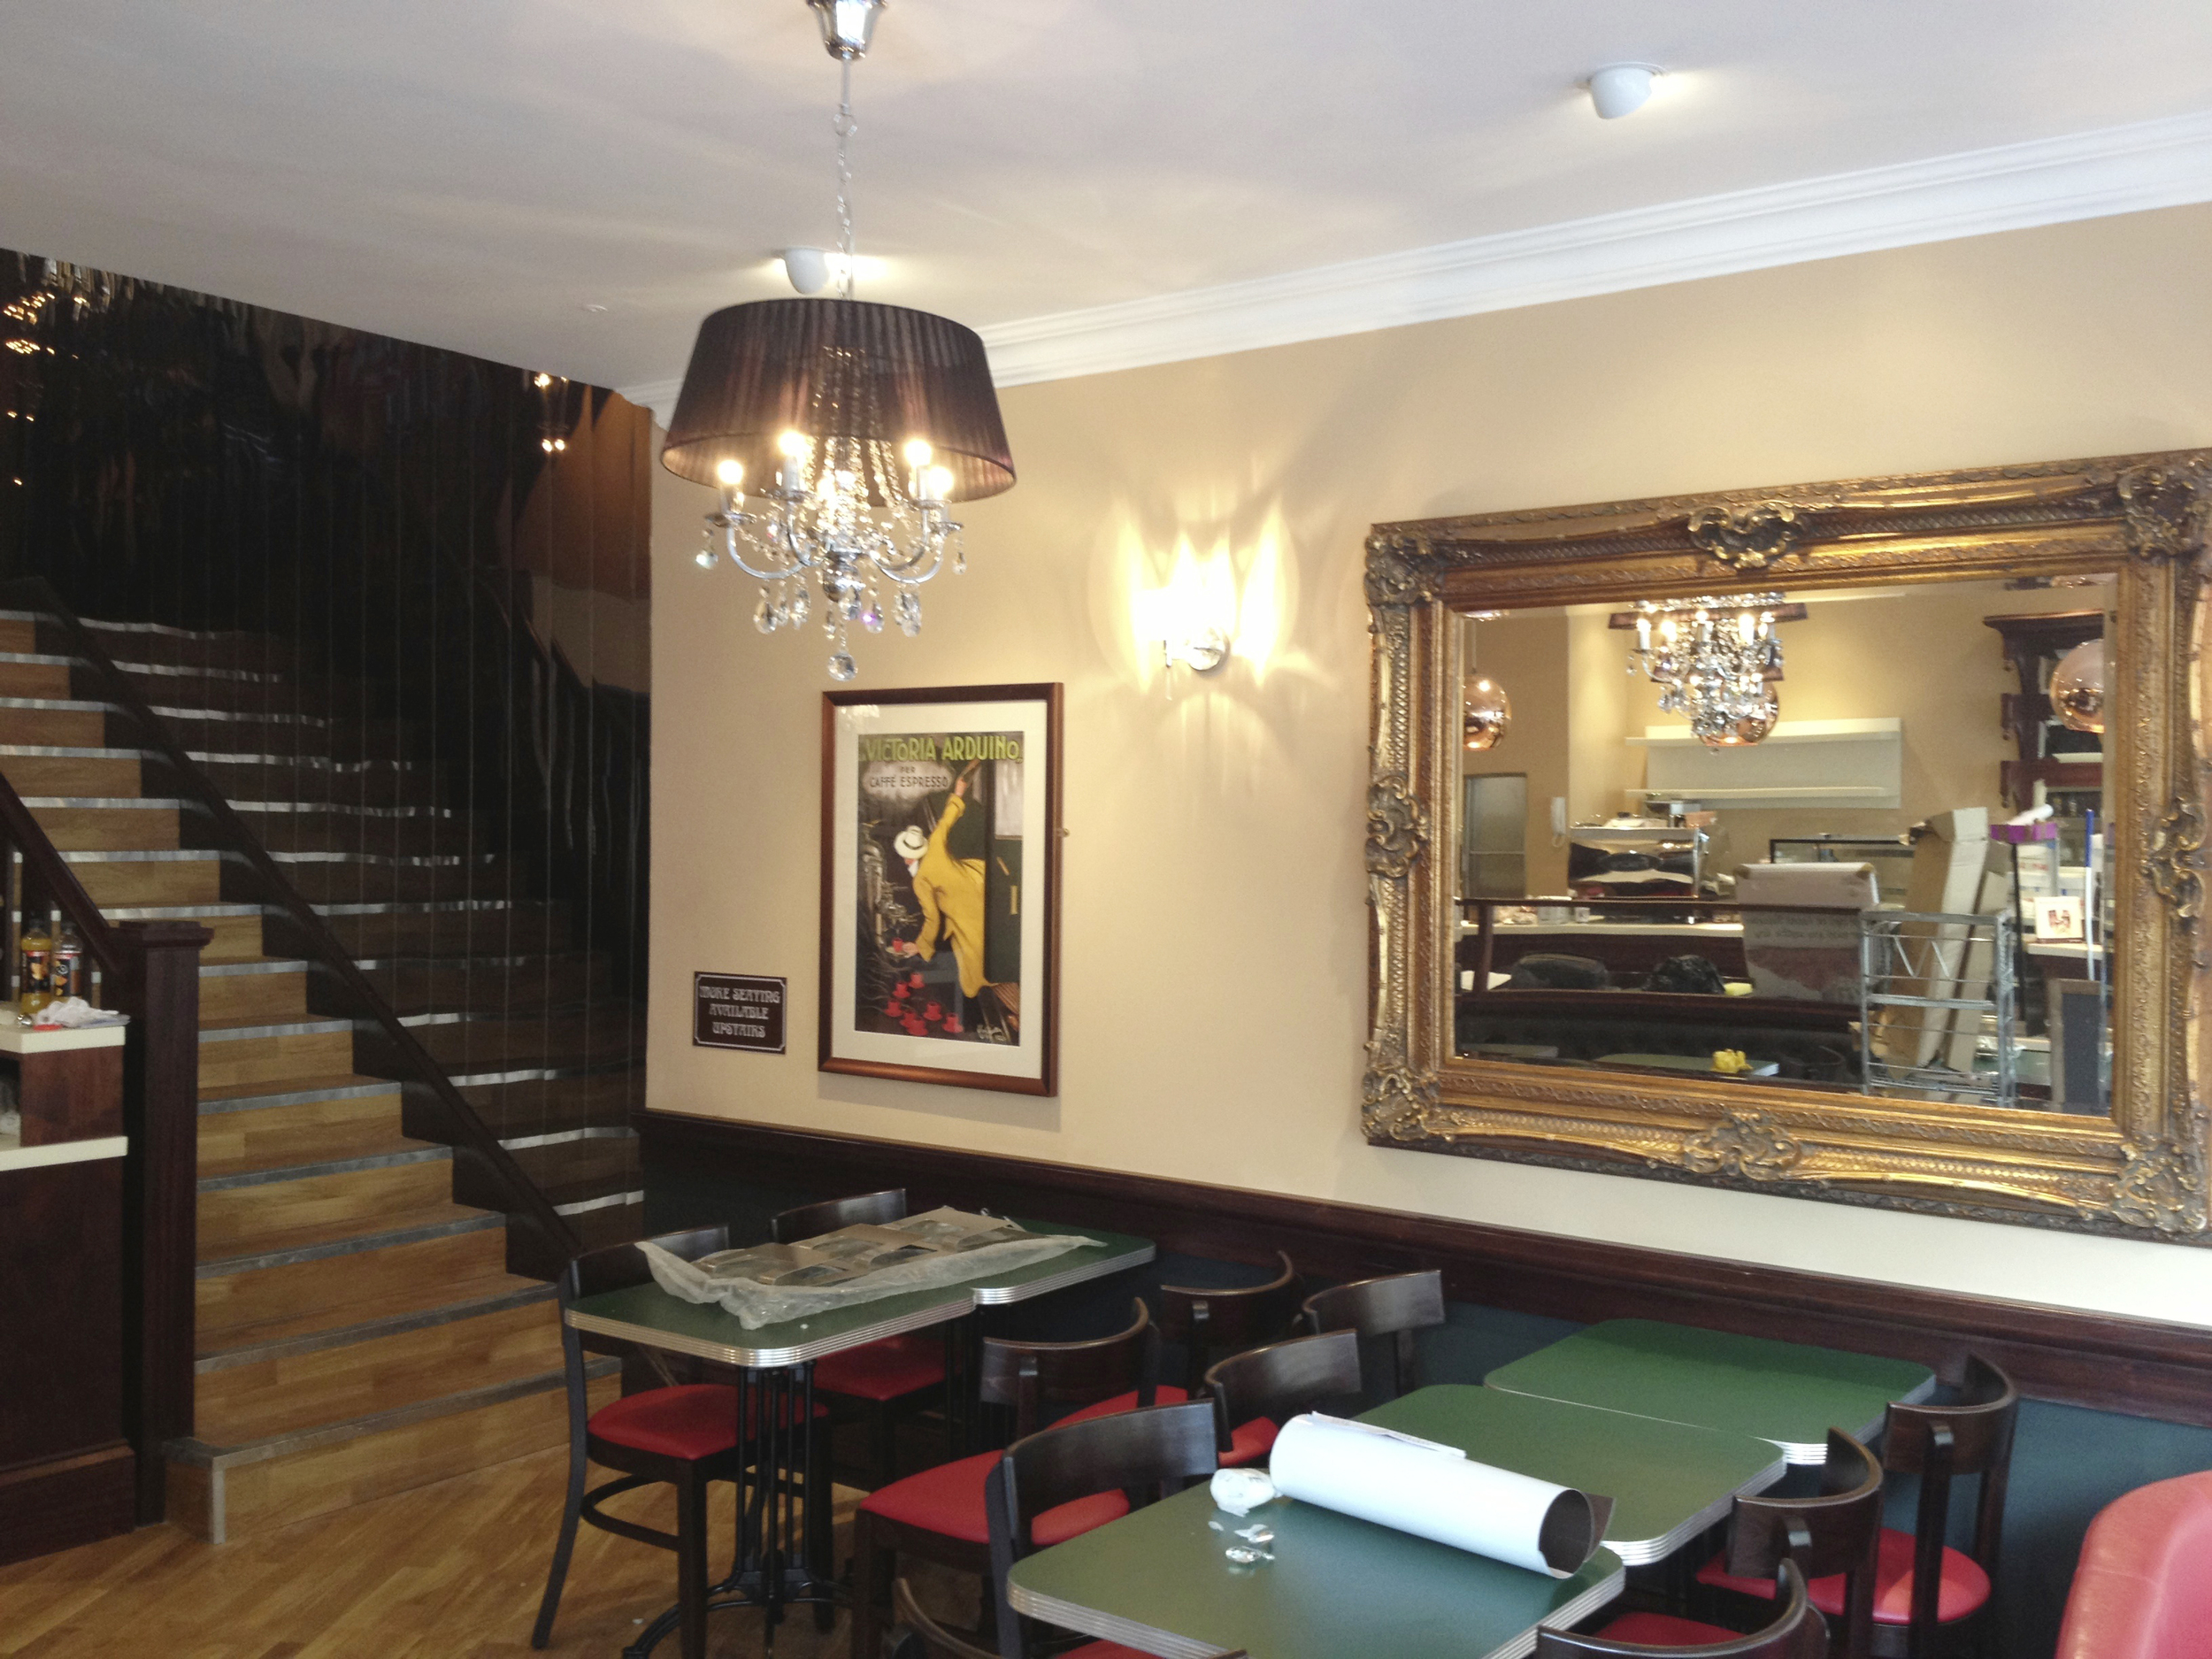 #NHRenovations #Painter #Decorator #London #Gloucester #PatisserieValerie #Shop